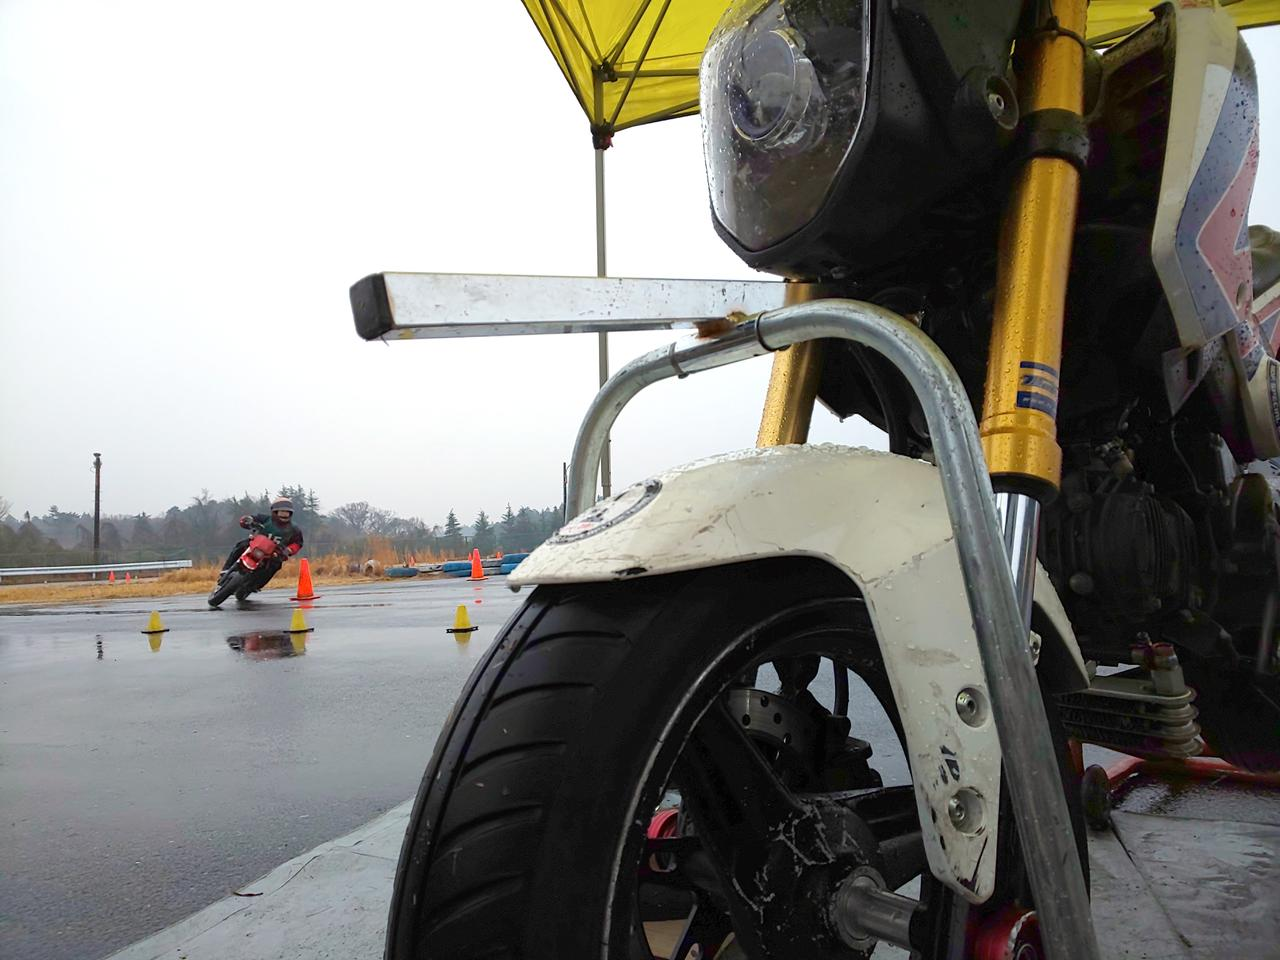 Images : 20番目の画像 - ジムカーナの練習風景 - webオートバイ